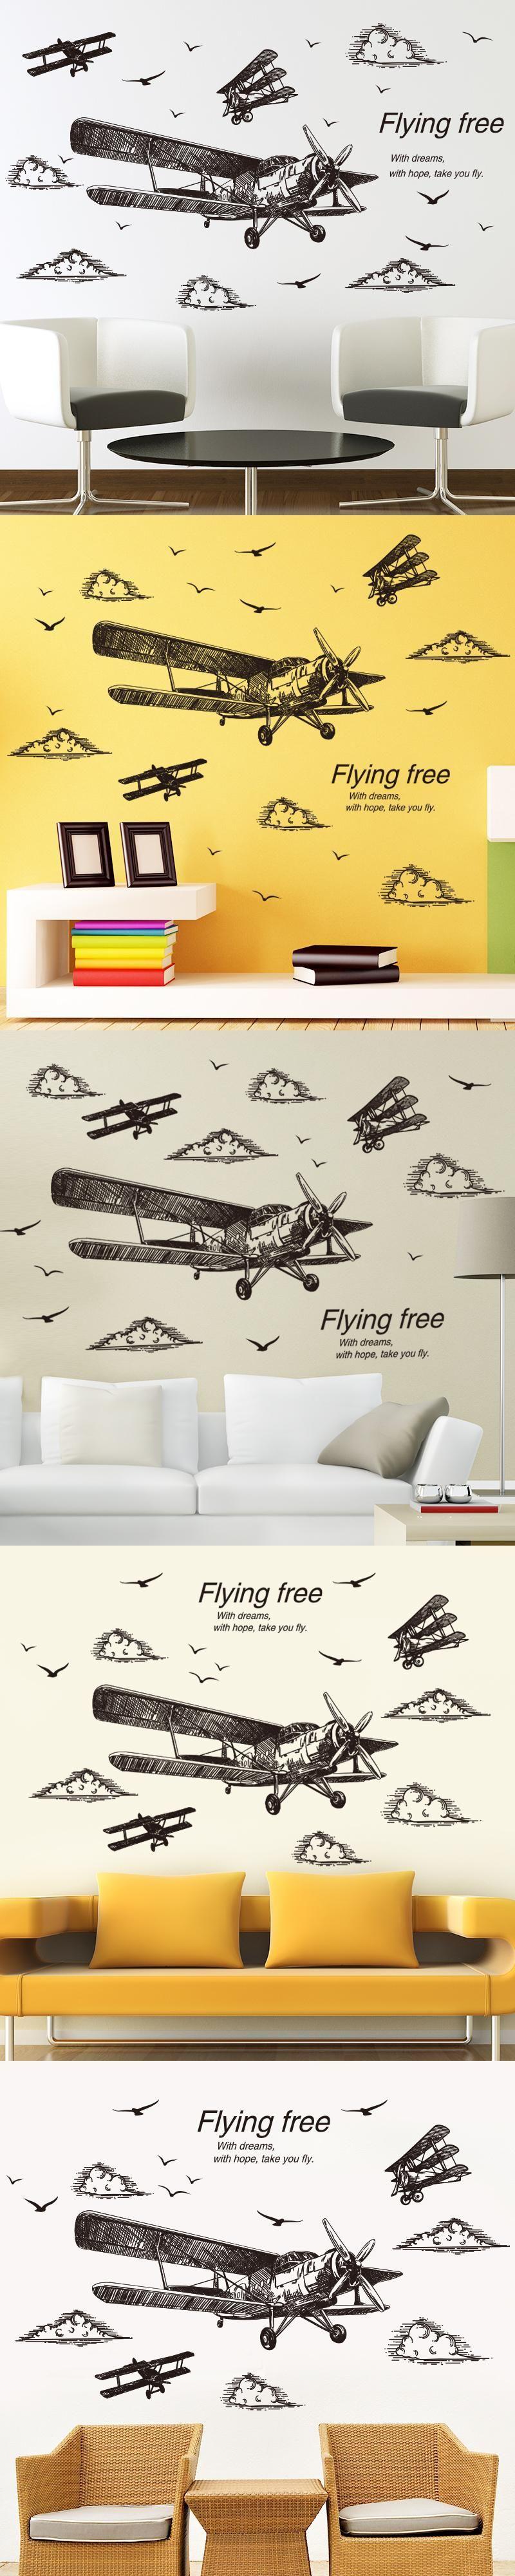 SHIJUEHEZI] Freehand Sketching Airplane 3D Wall Stickers Vinyl ...